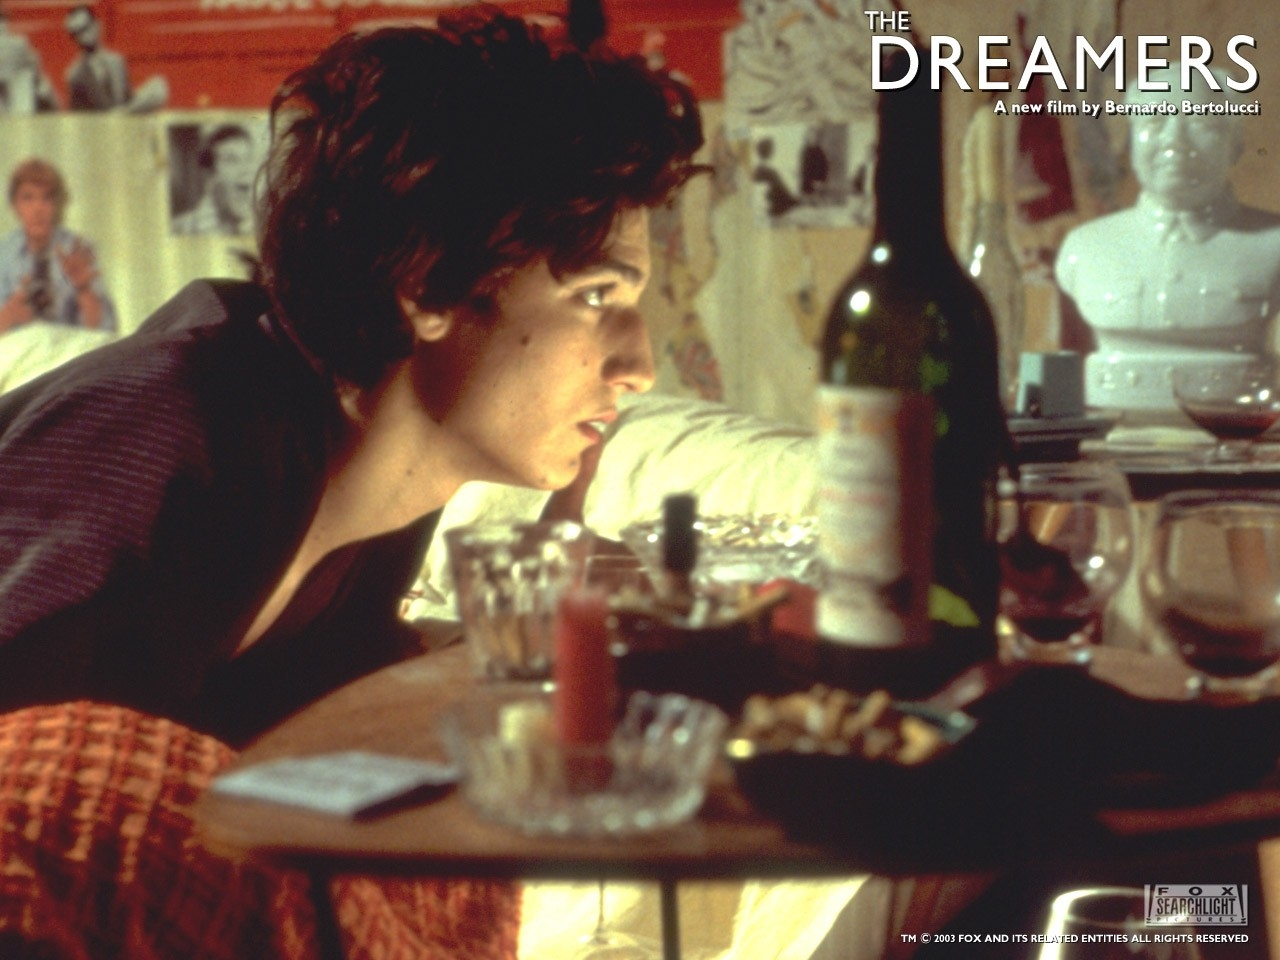 Wallpaper del film The dreamers - I sognatori con Louis Garrel